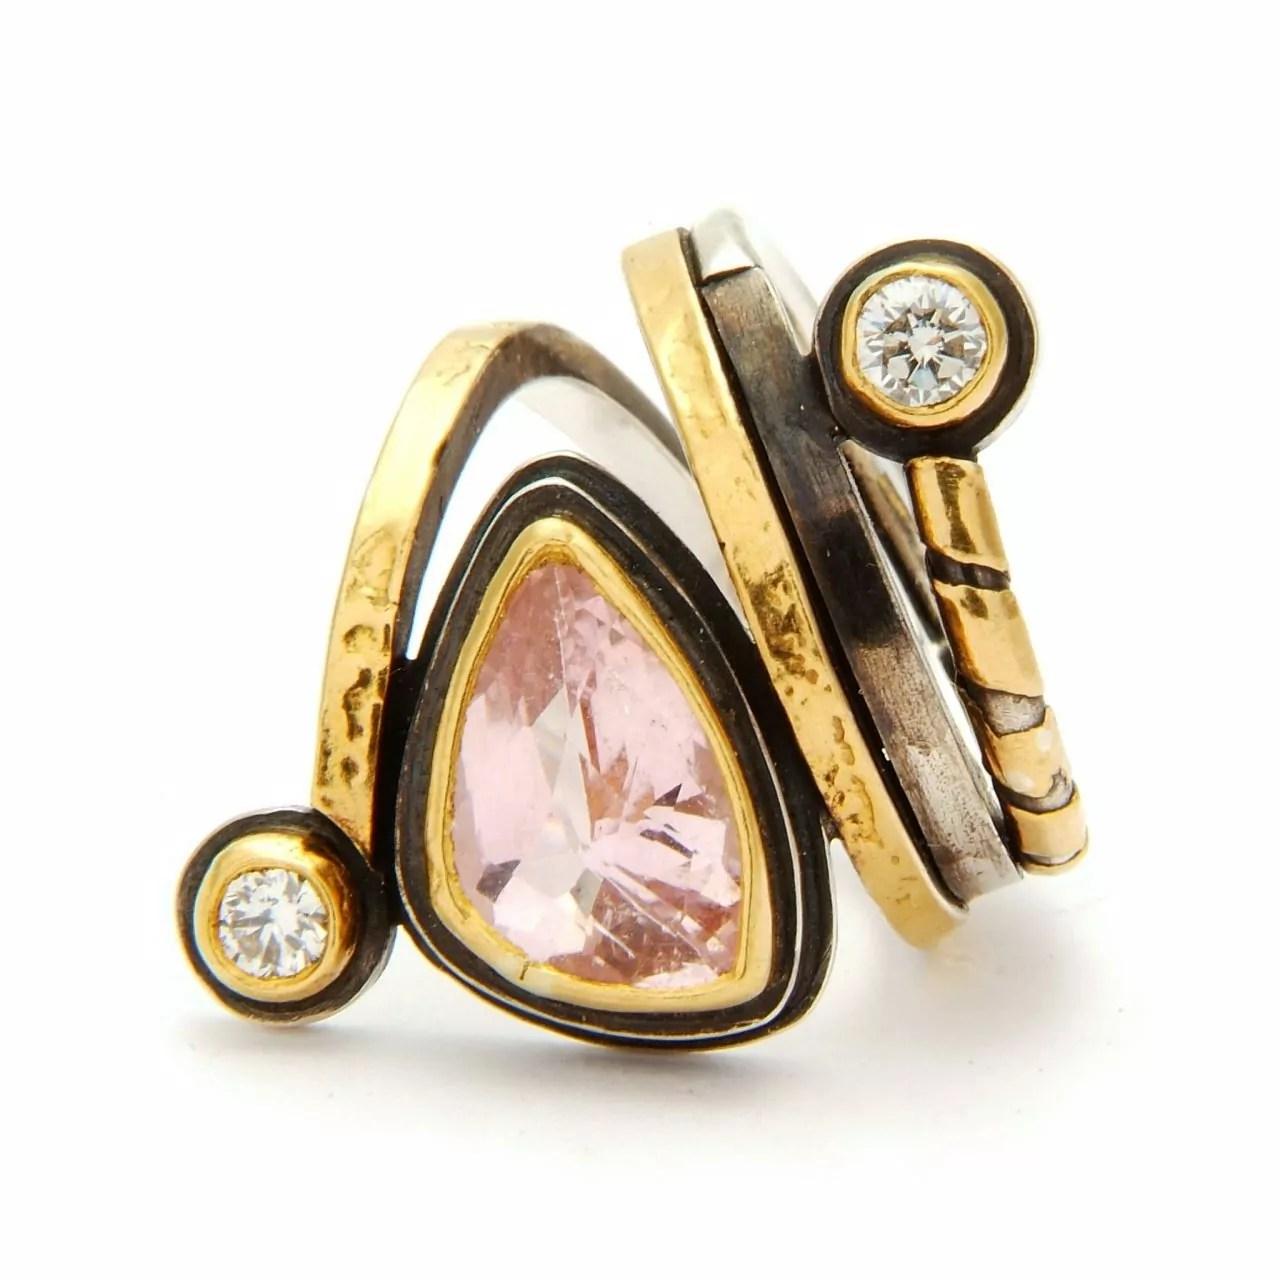 Pink Tourmaline and White Diamond Ring